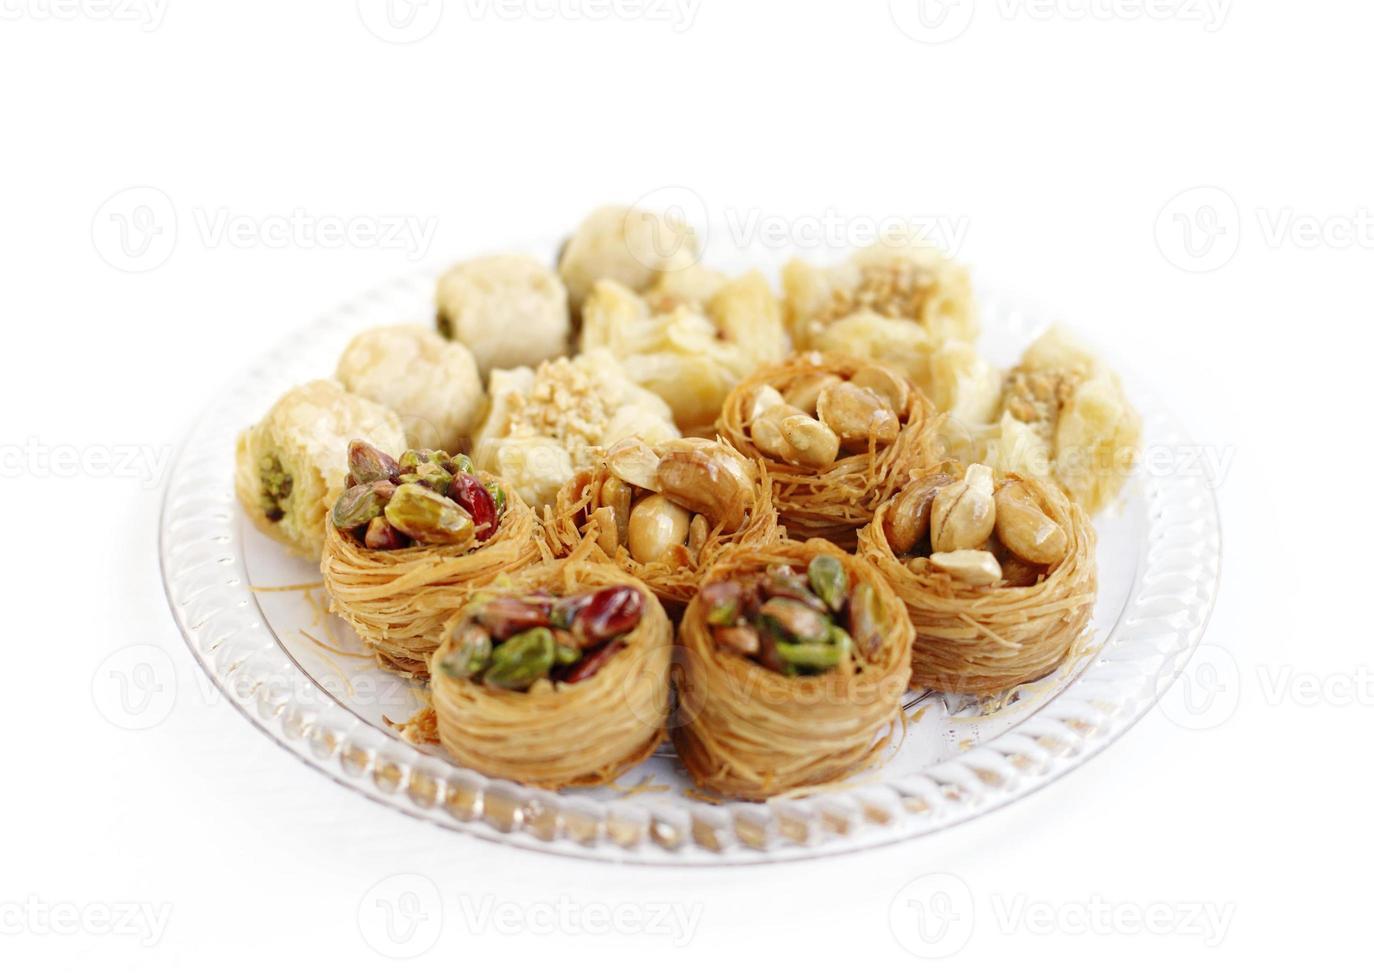 deliciosos surtidos dulces árabes tradicionales baklava, se centran en anacardos baklava foto